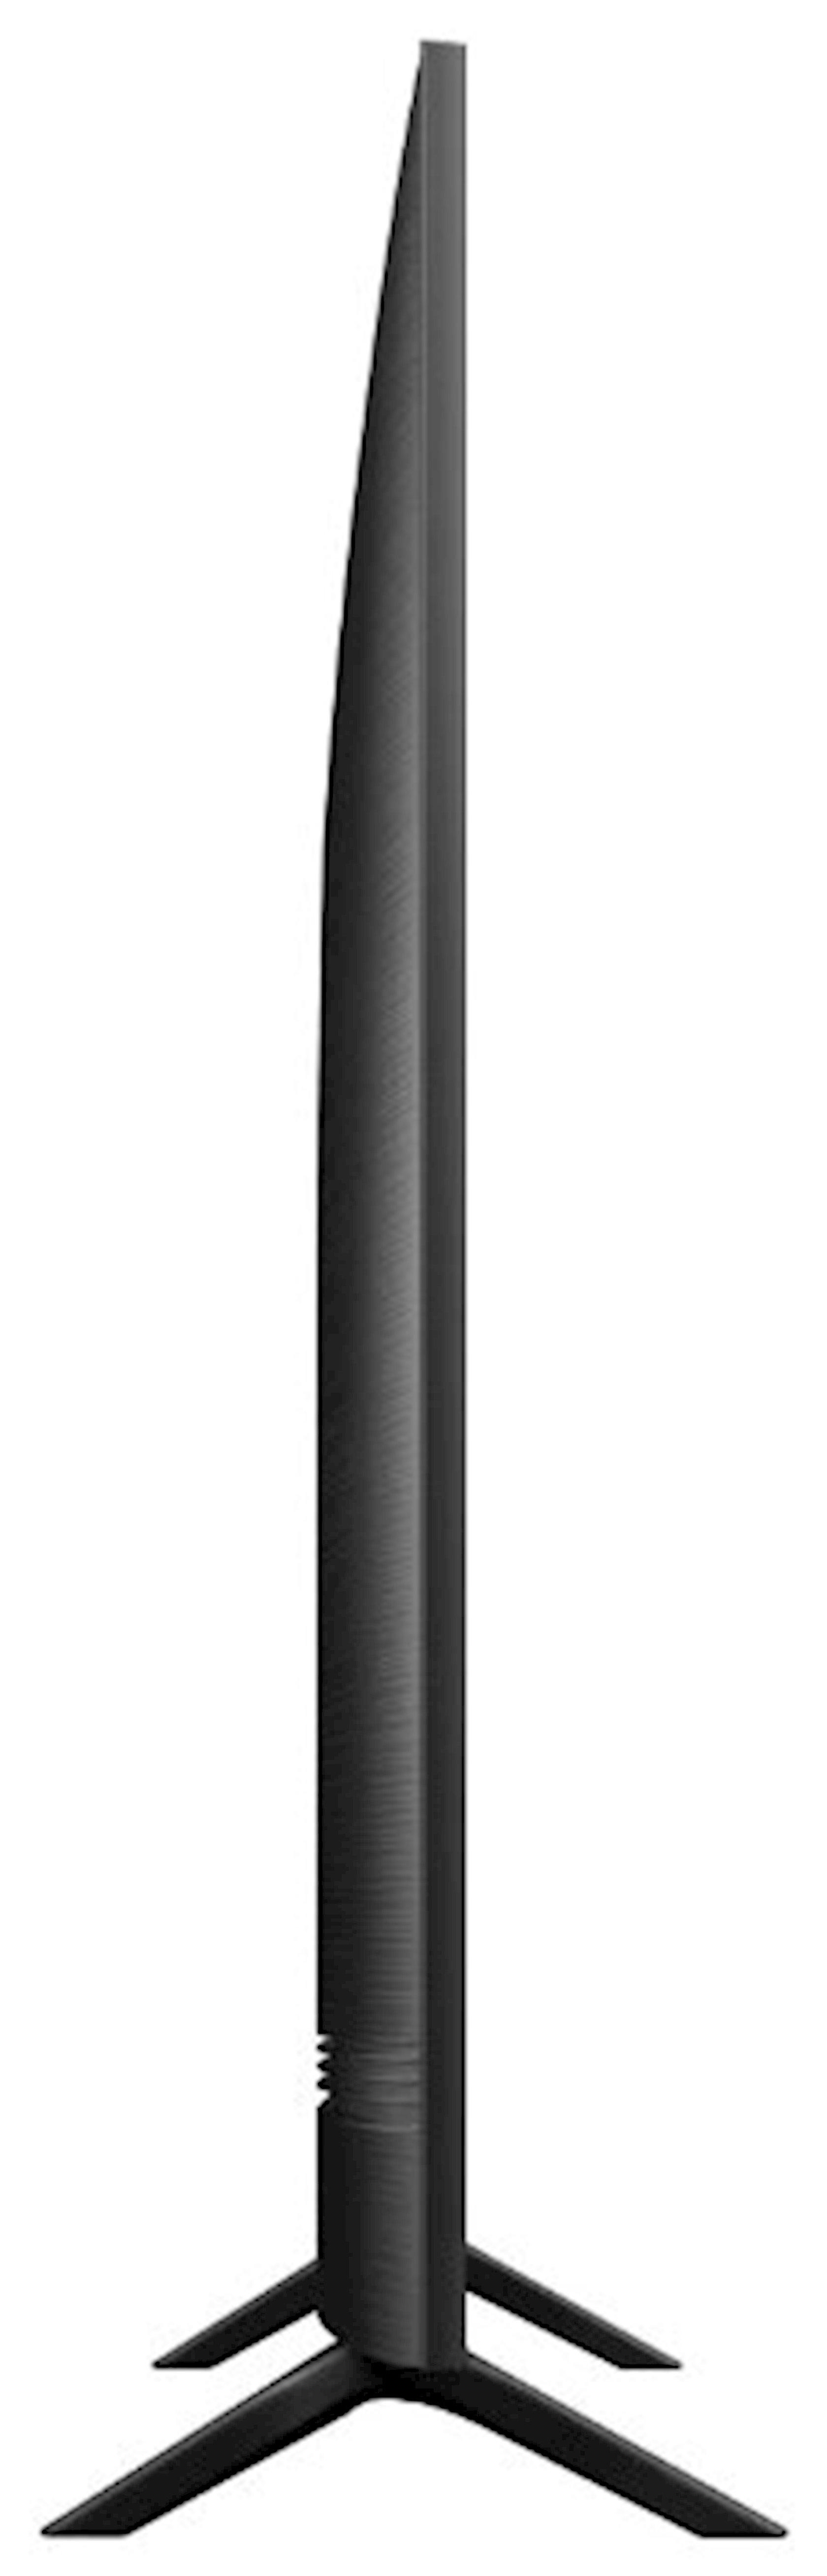 Televizor Samsung QE43Q67TAUXRU